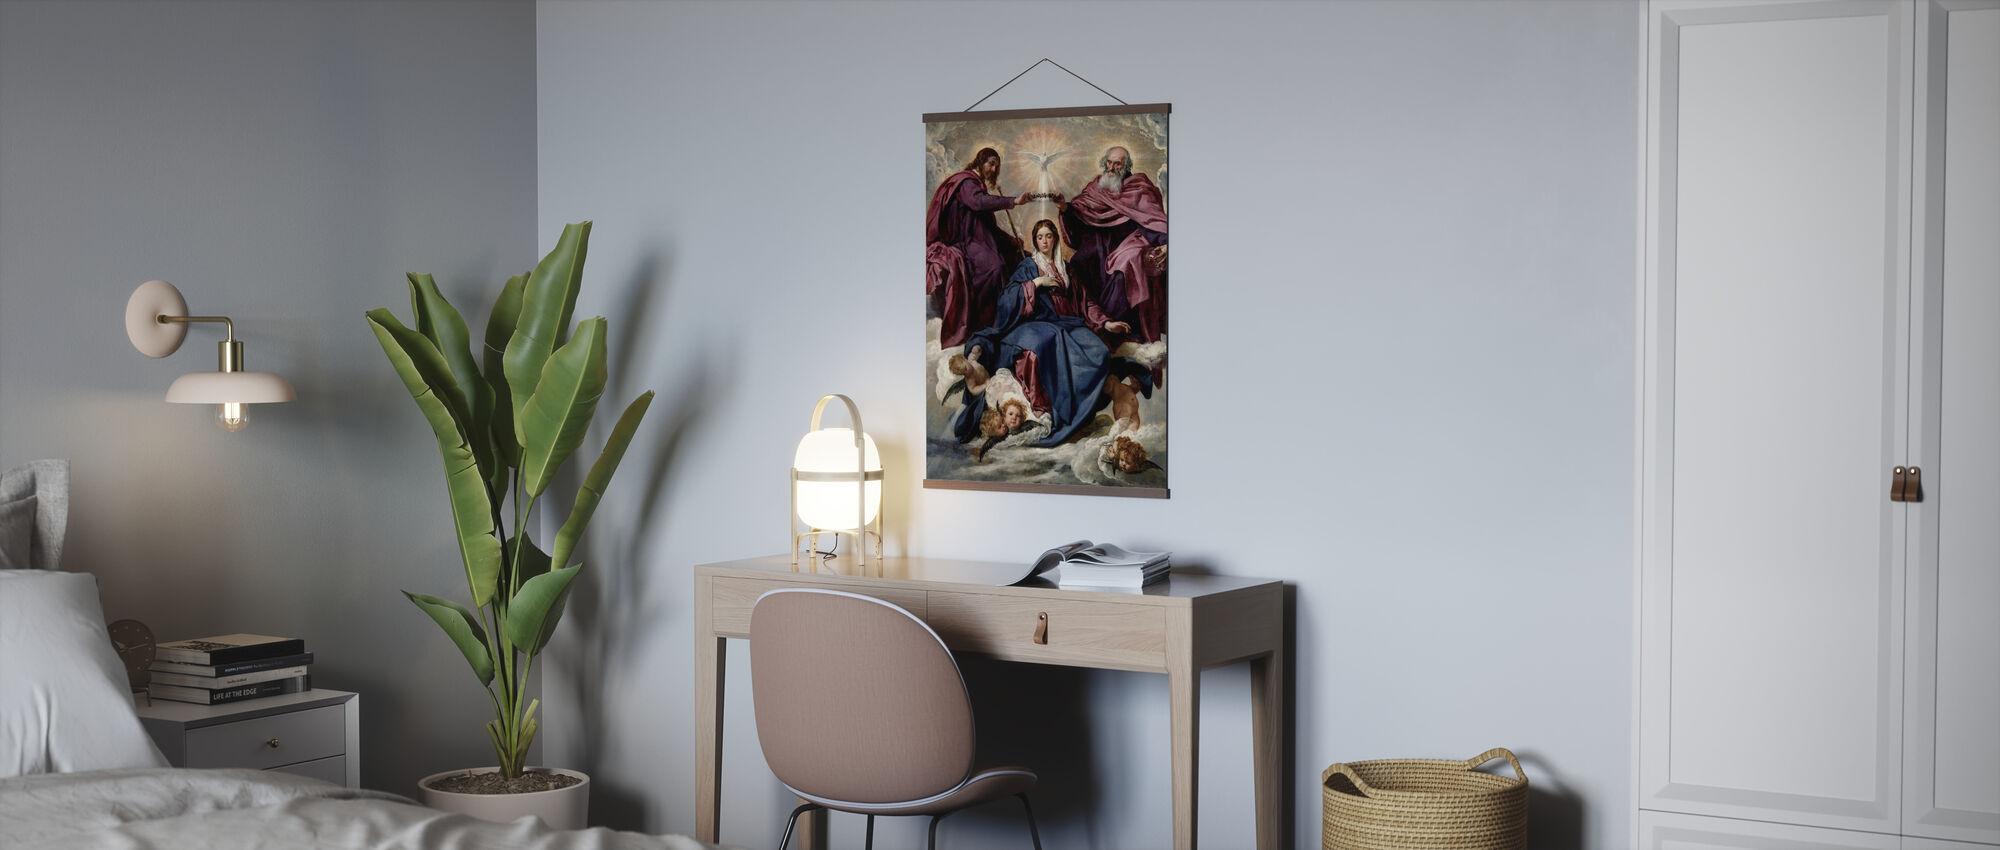 Kroning - Diego Velazquez - Plakat - Kontor